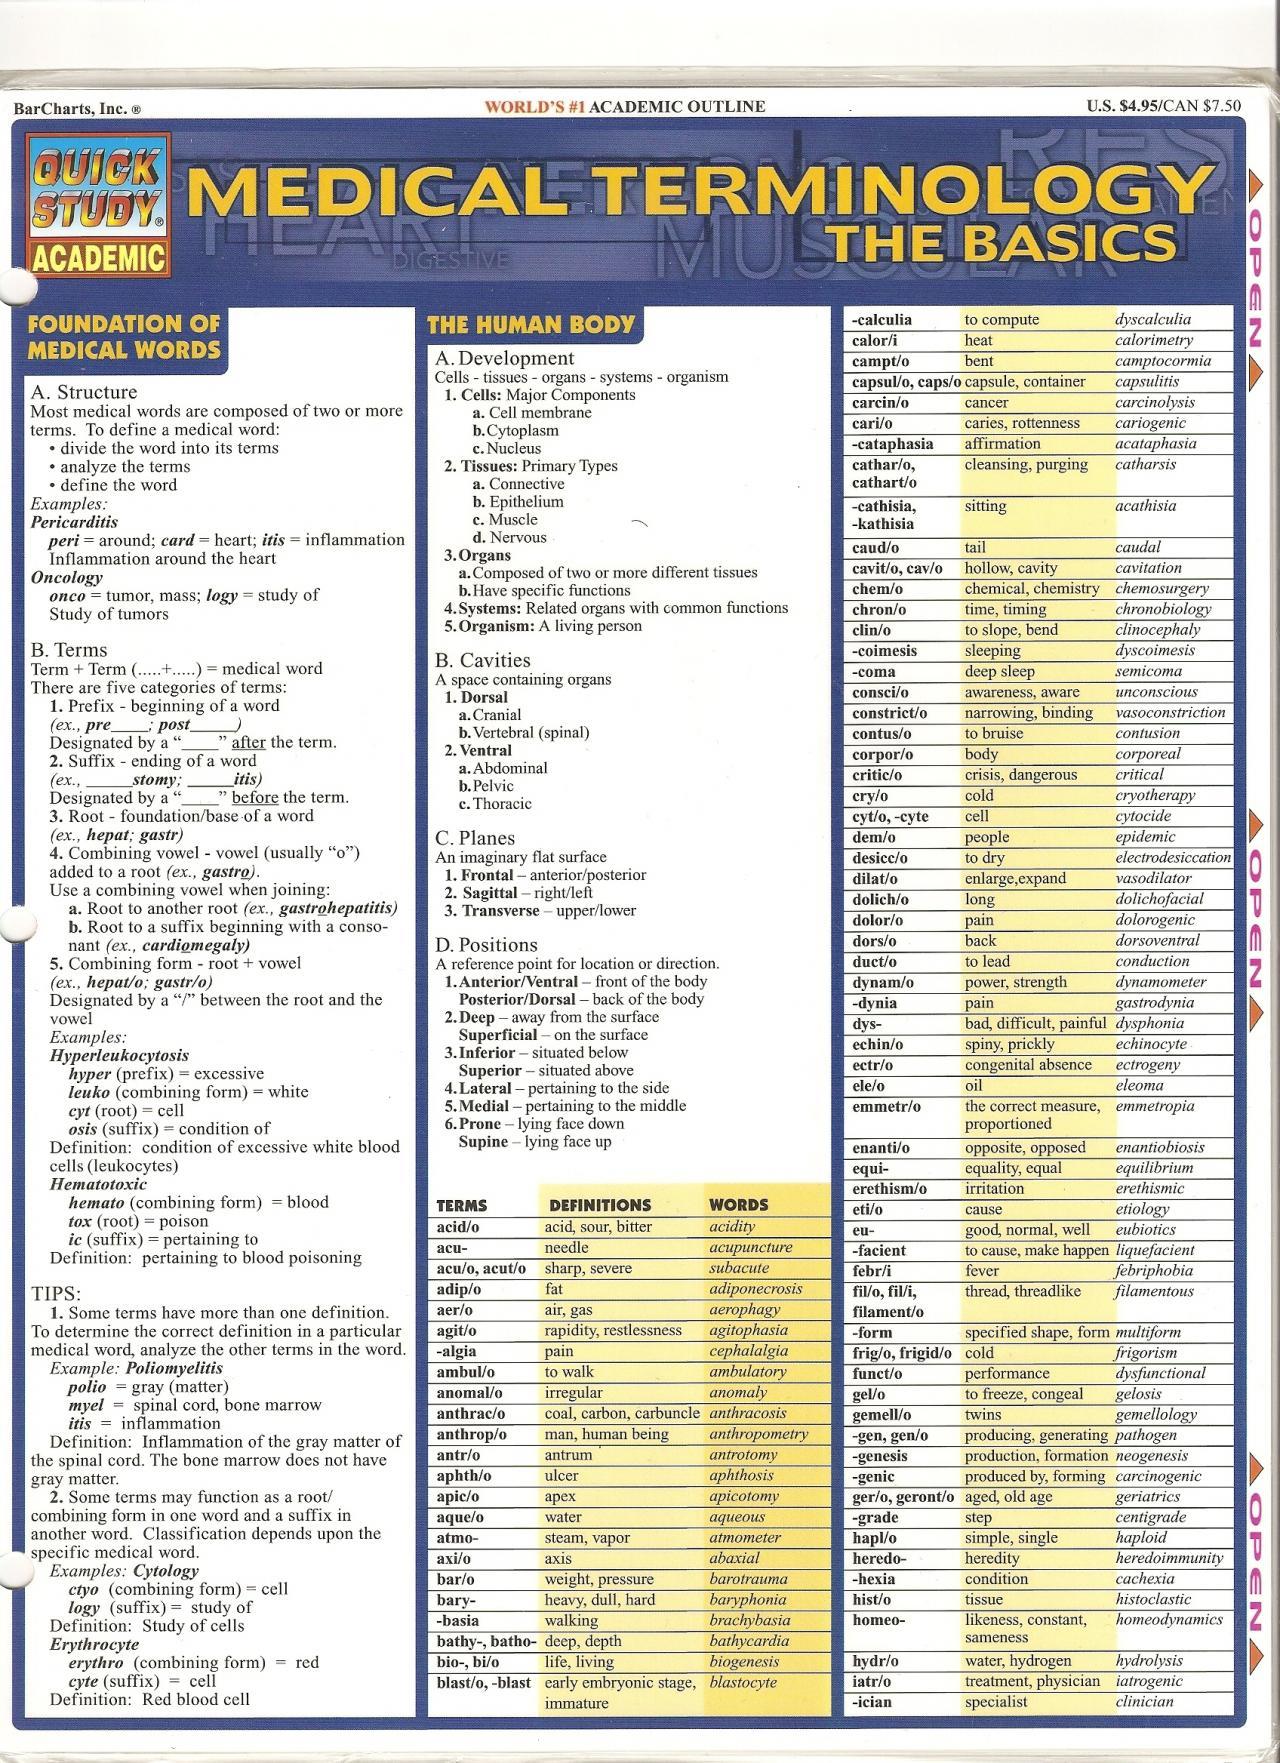 Basic Medical Terminology